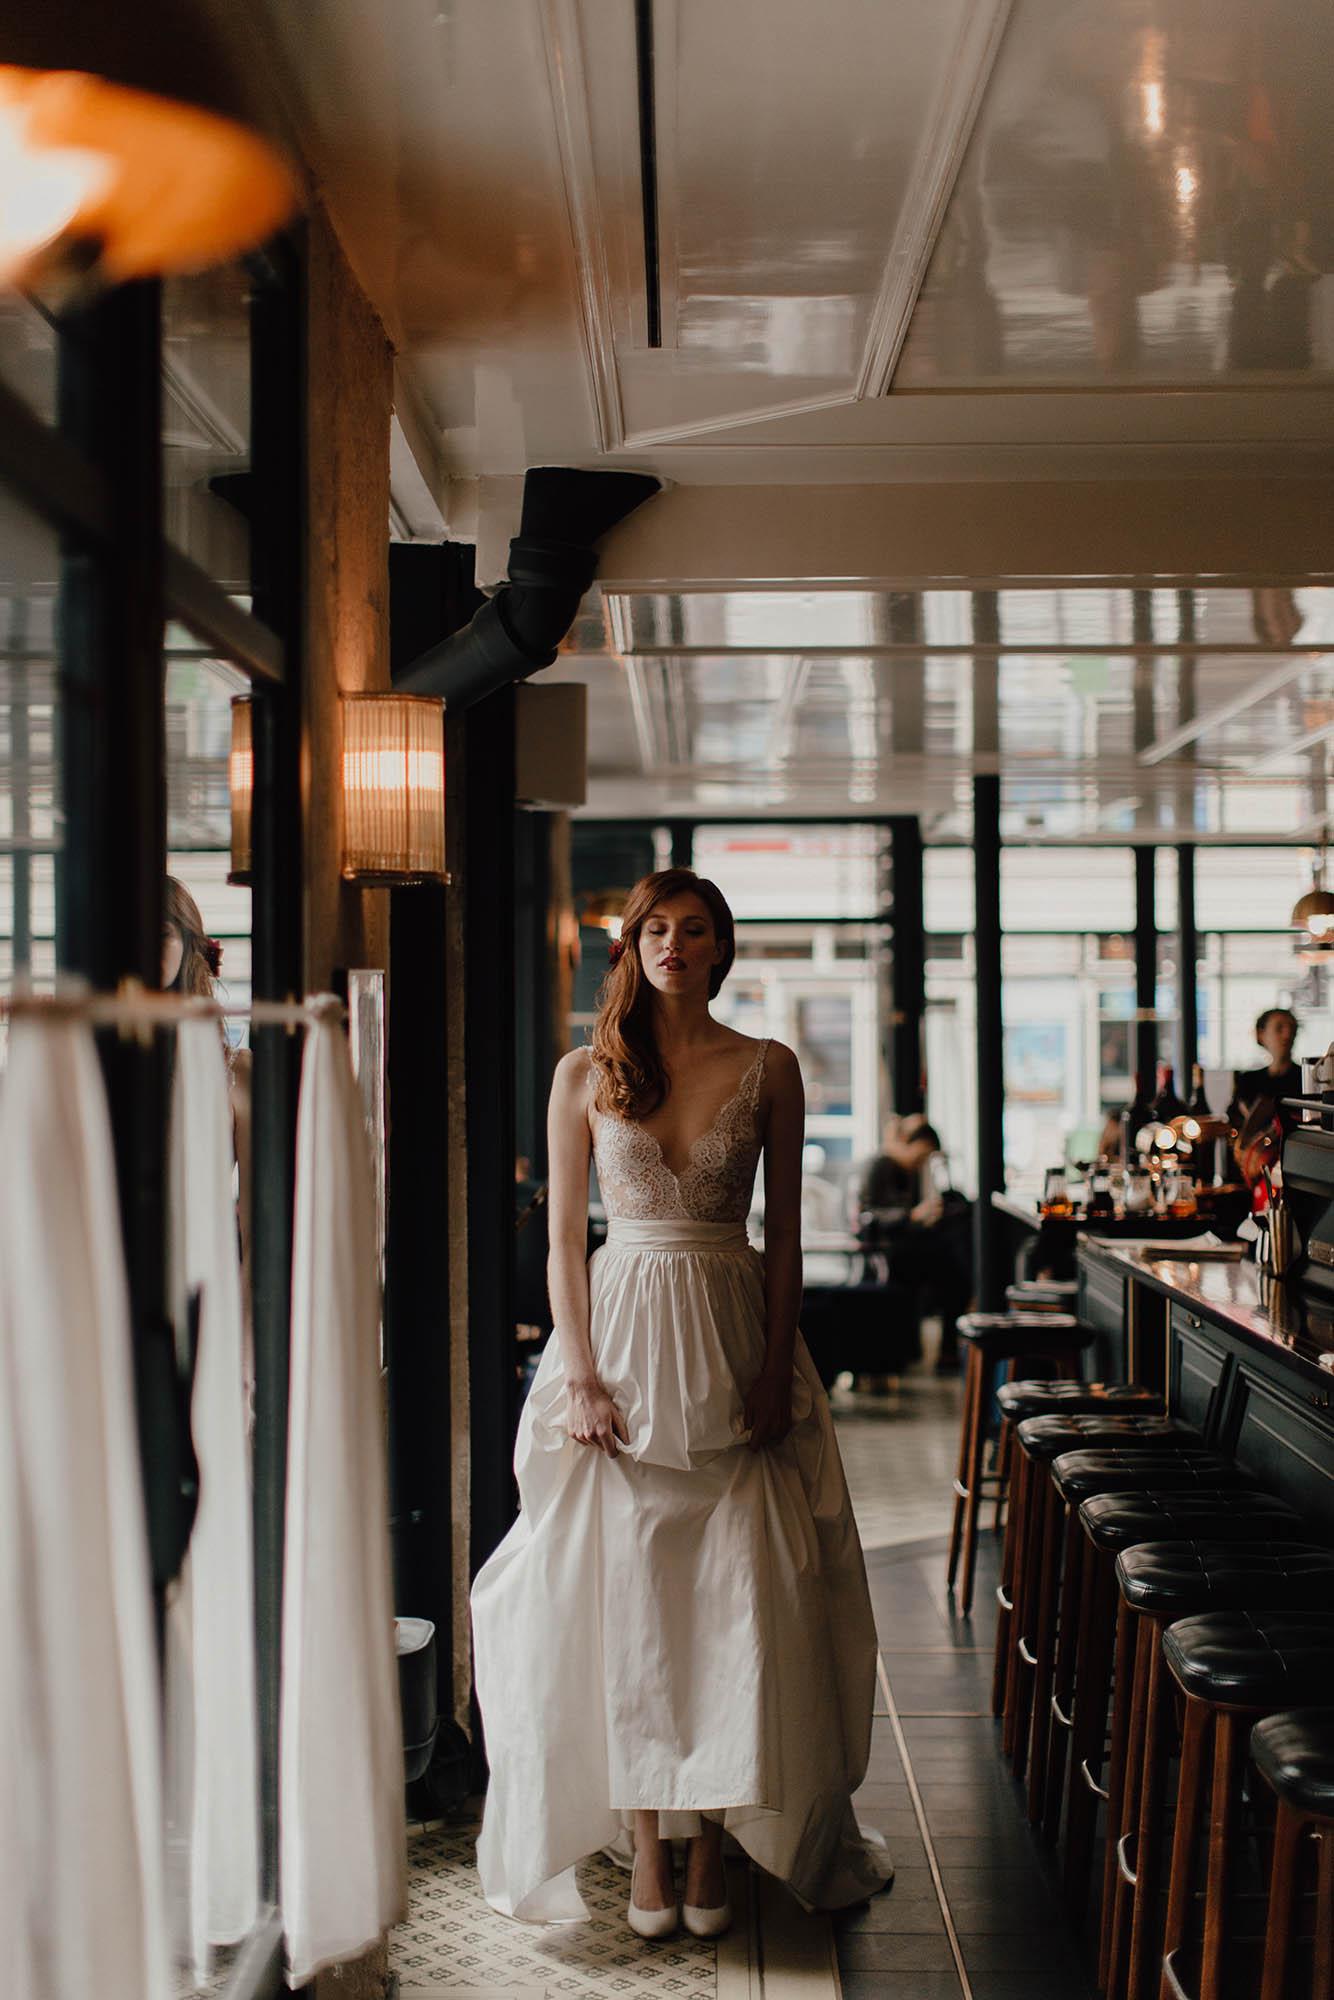 youmademydayphotography-destination-wedding-photographer-david-purves-boheme-rock-paris-web-77